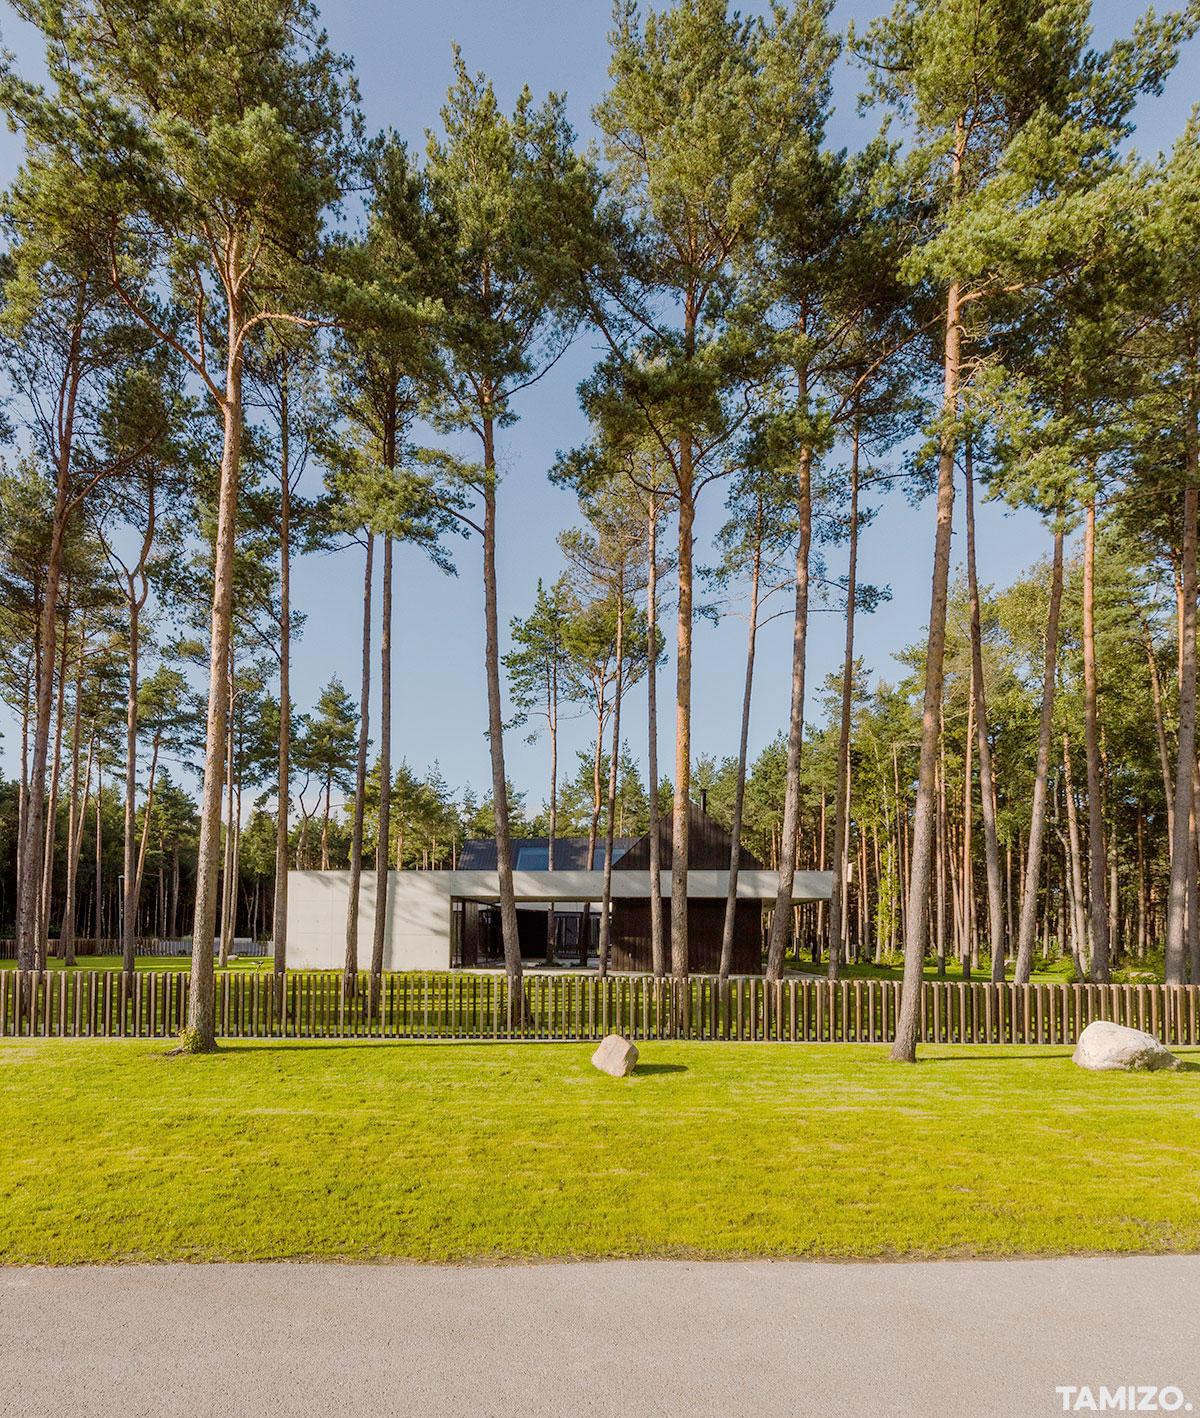 A064_estonia_tallin_foto_viimsi_tamizo_architects_projekt_dom_w_lesie_residence_32